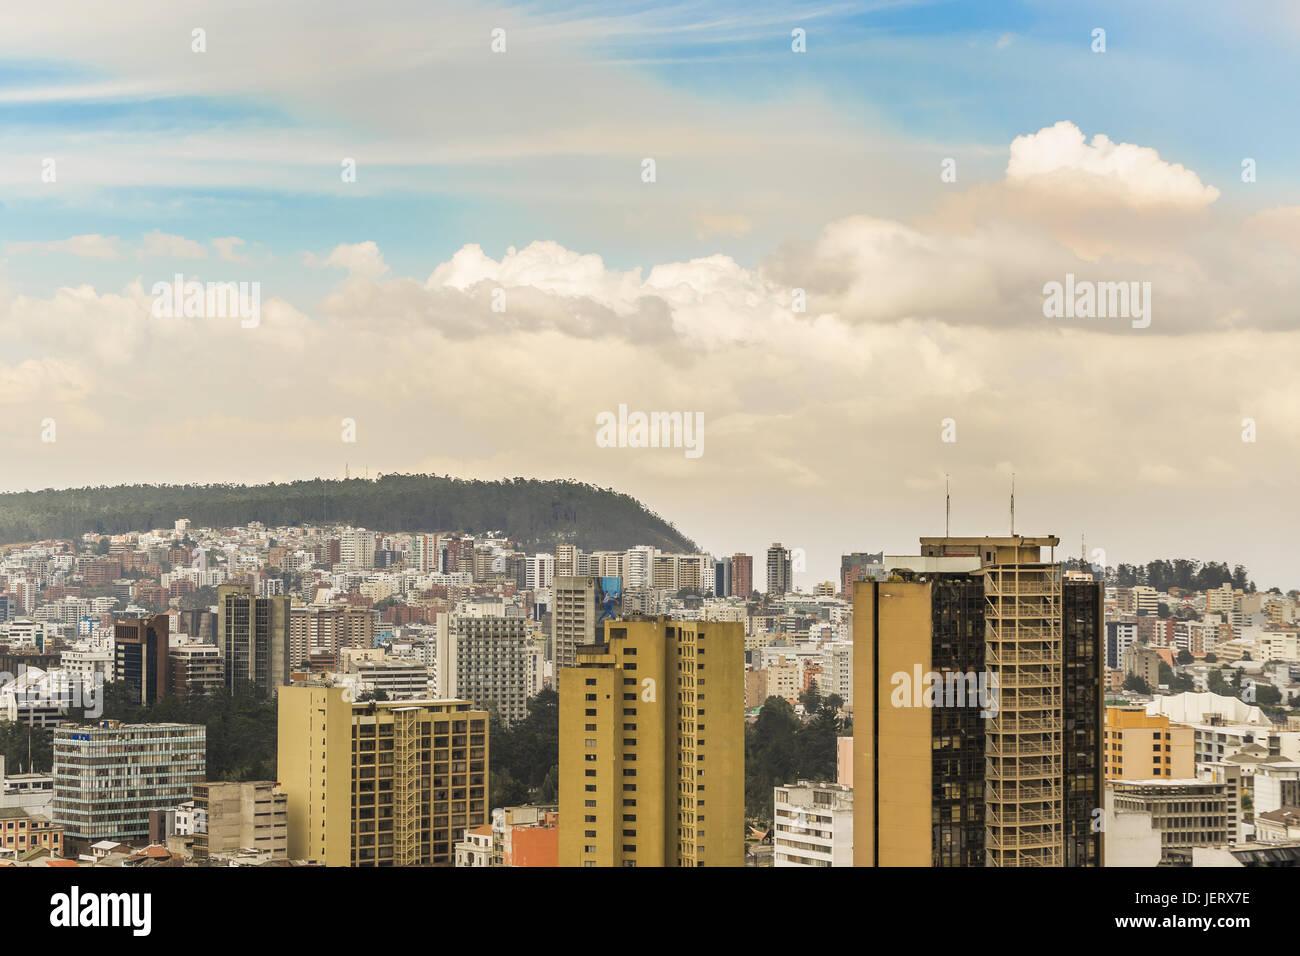 Paesaggio urbano vista aerea di Quito in Ecuador Immagini Stock